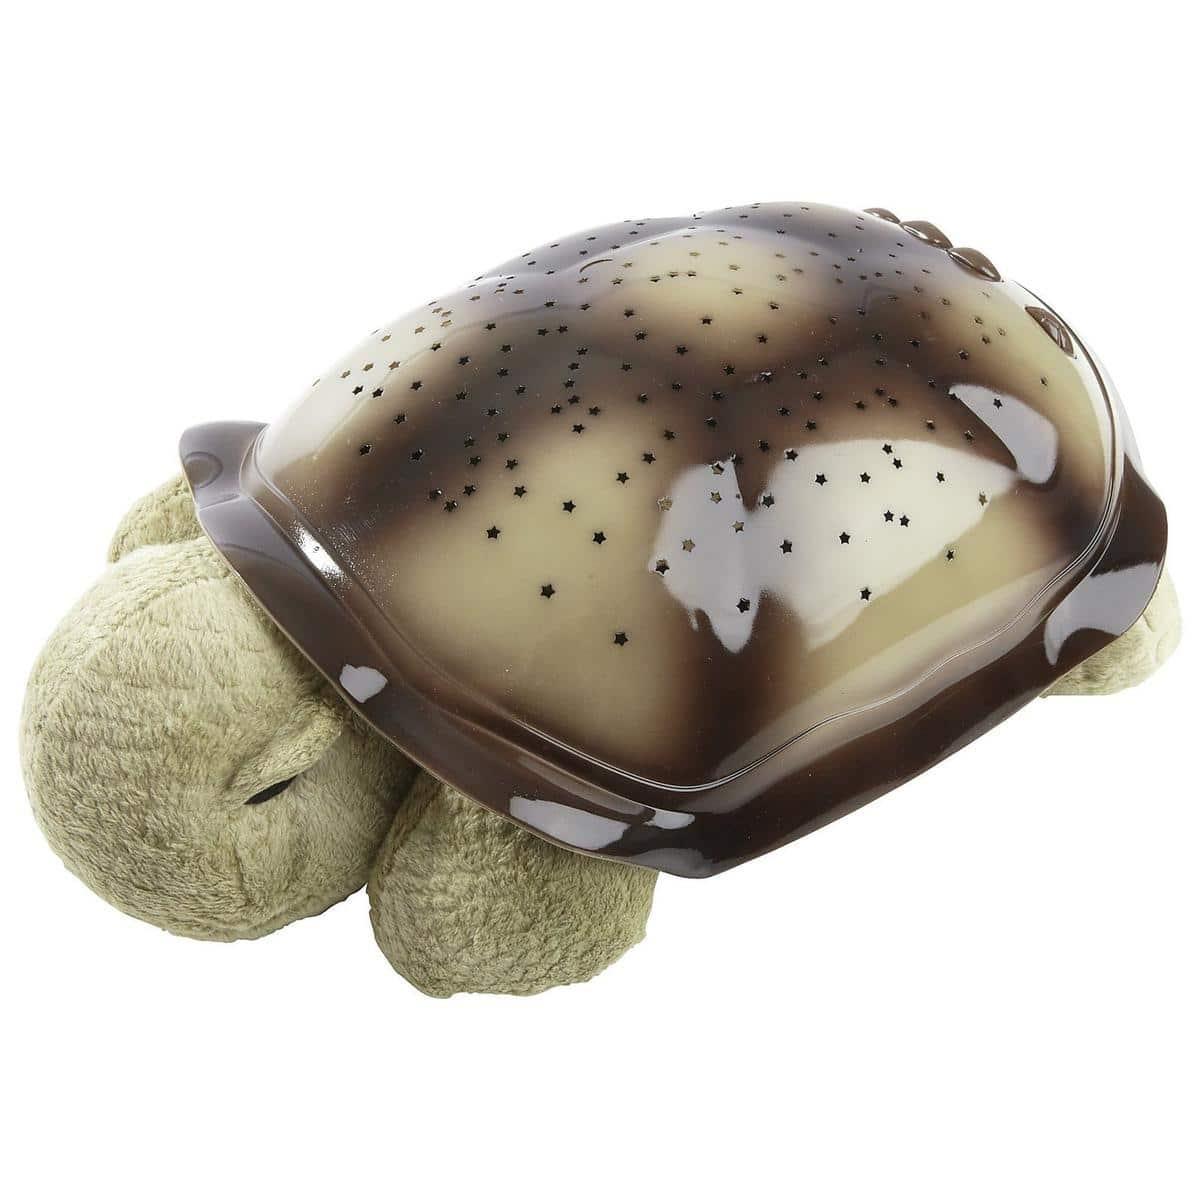 Twilight Turtle Classic Mocha.Twilight Turtle